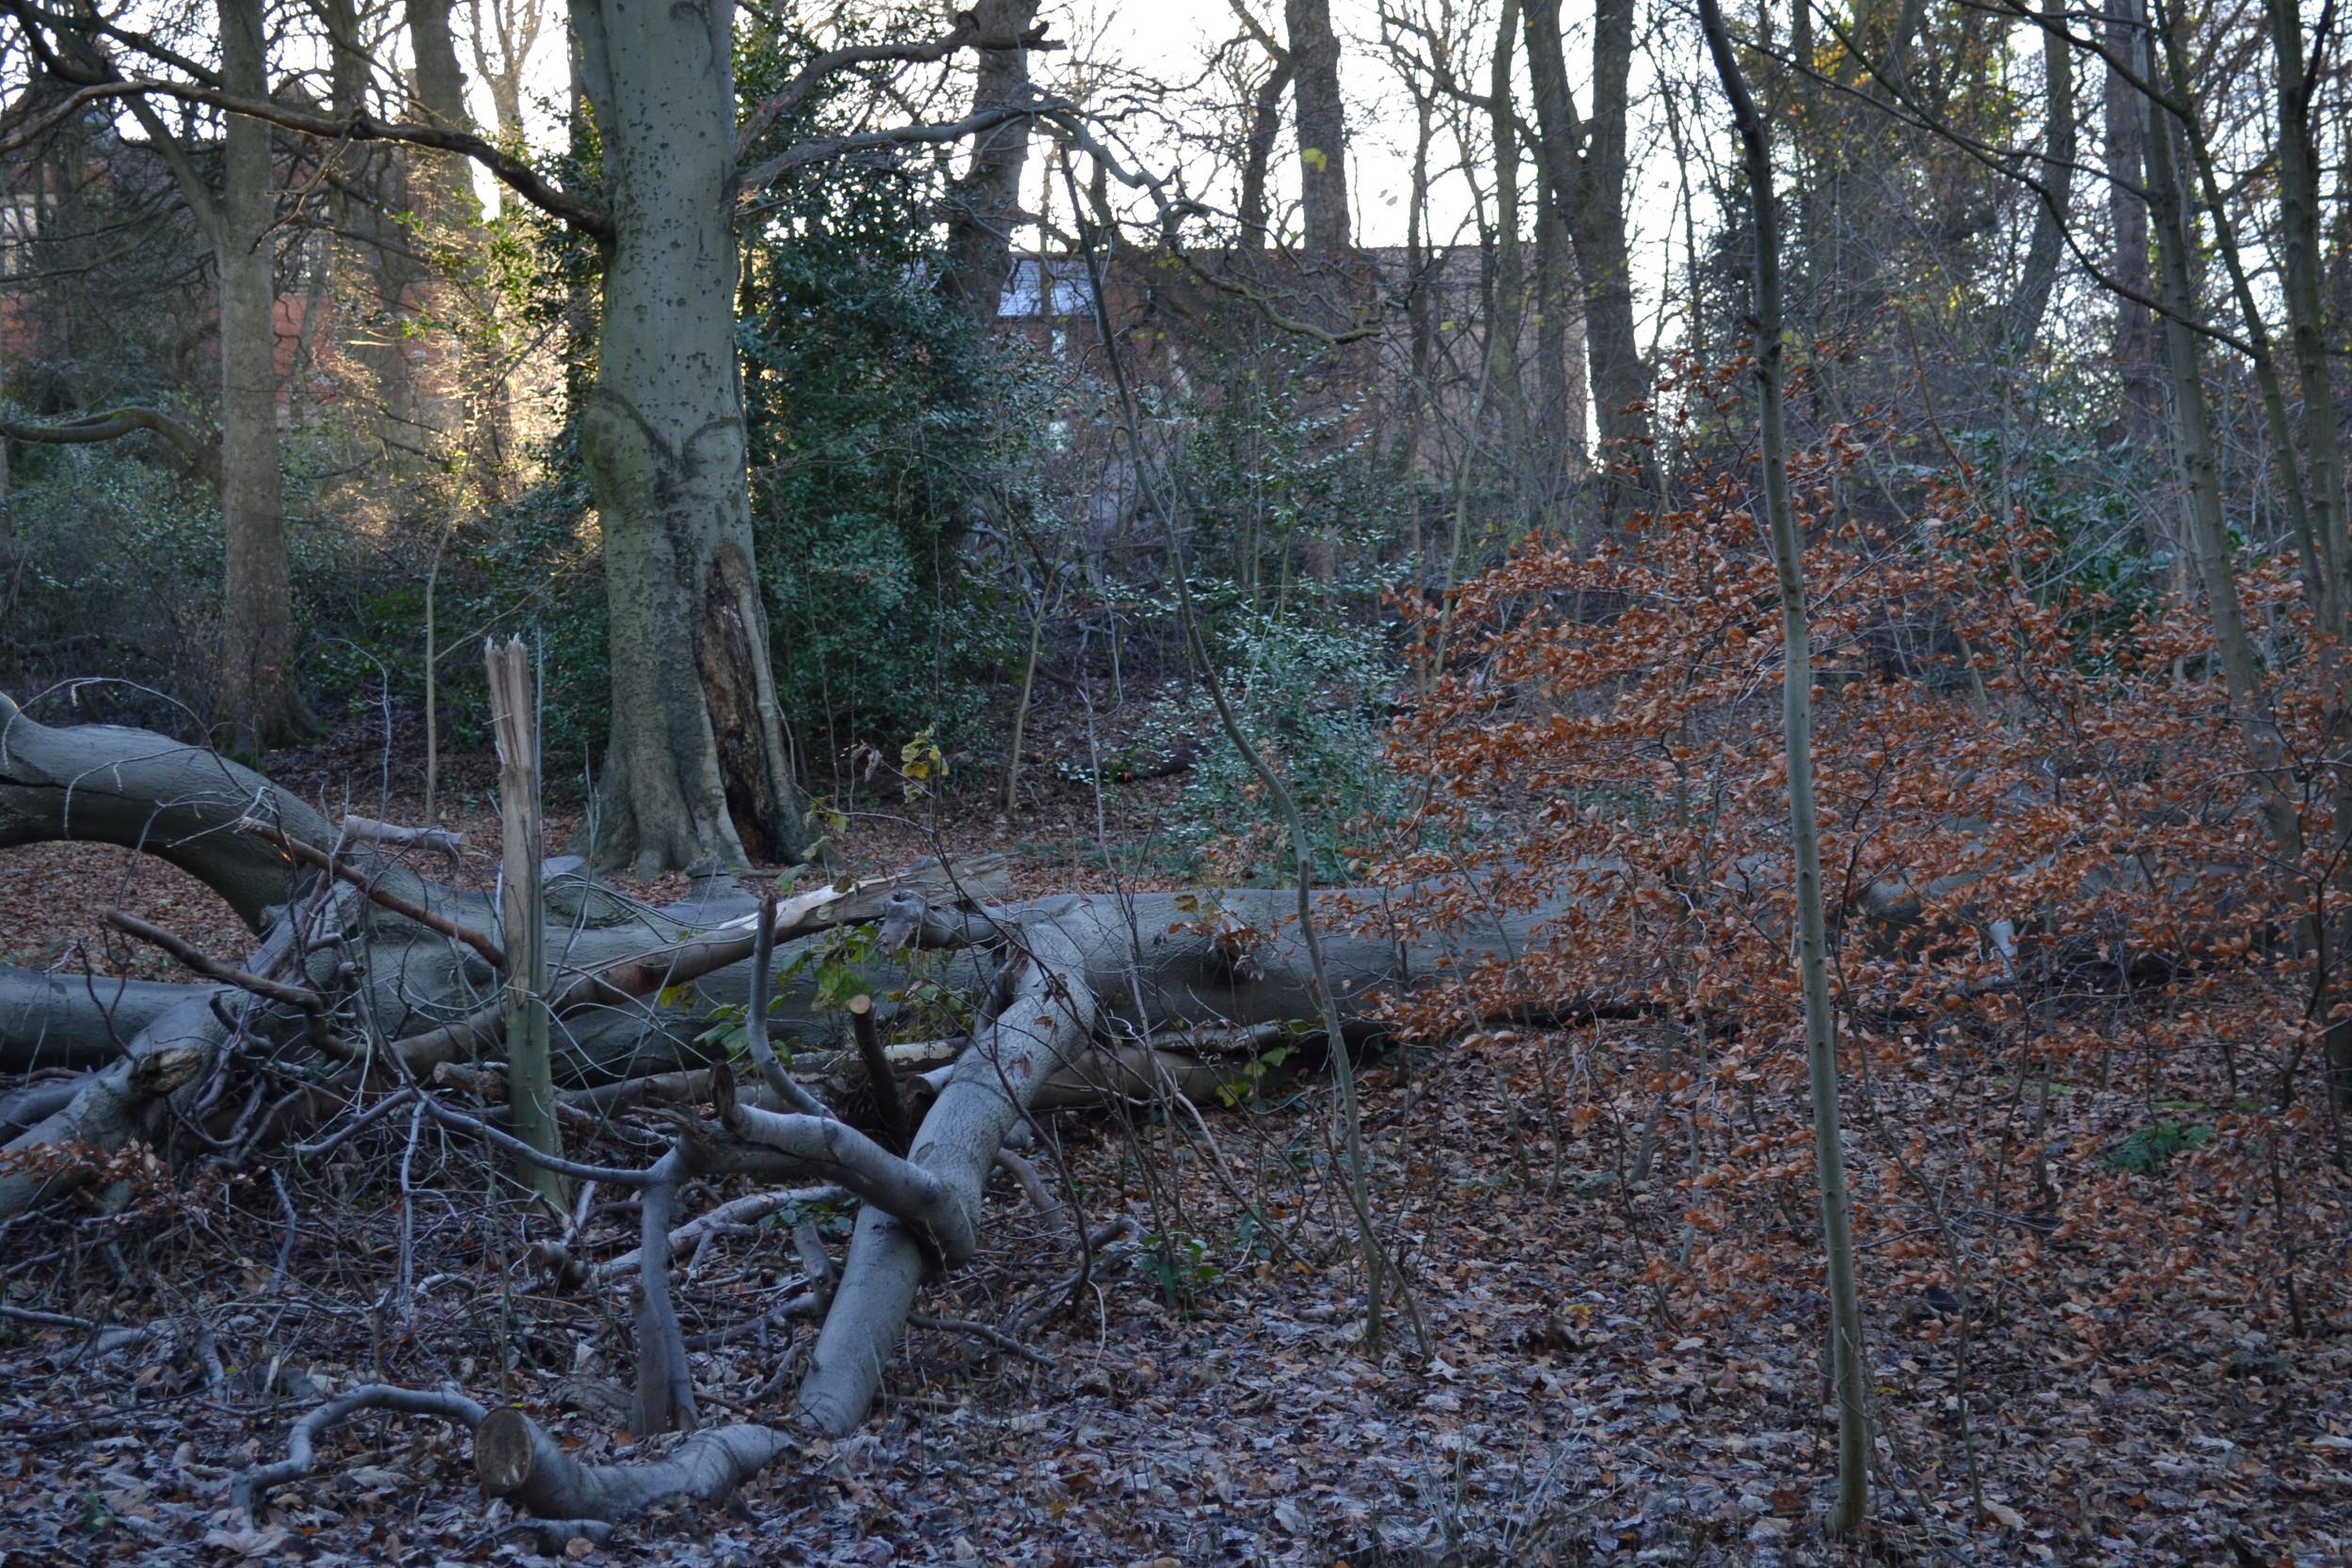 Heaton Park Dec. 13